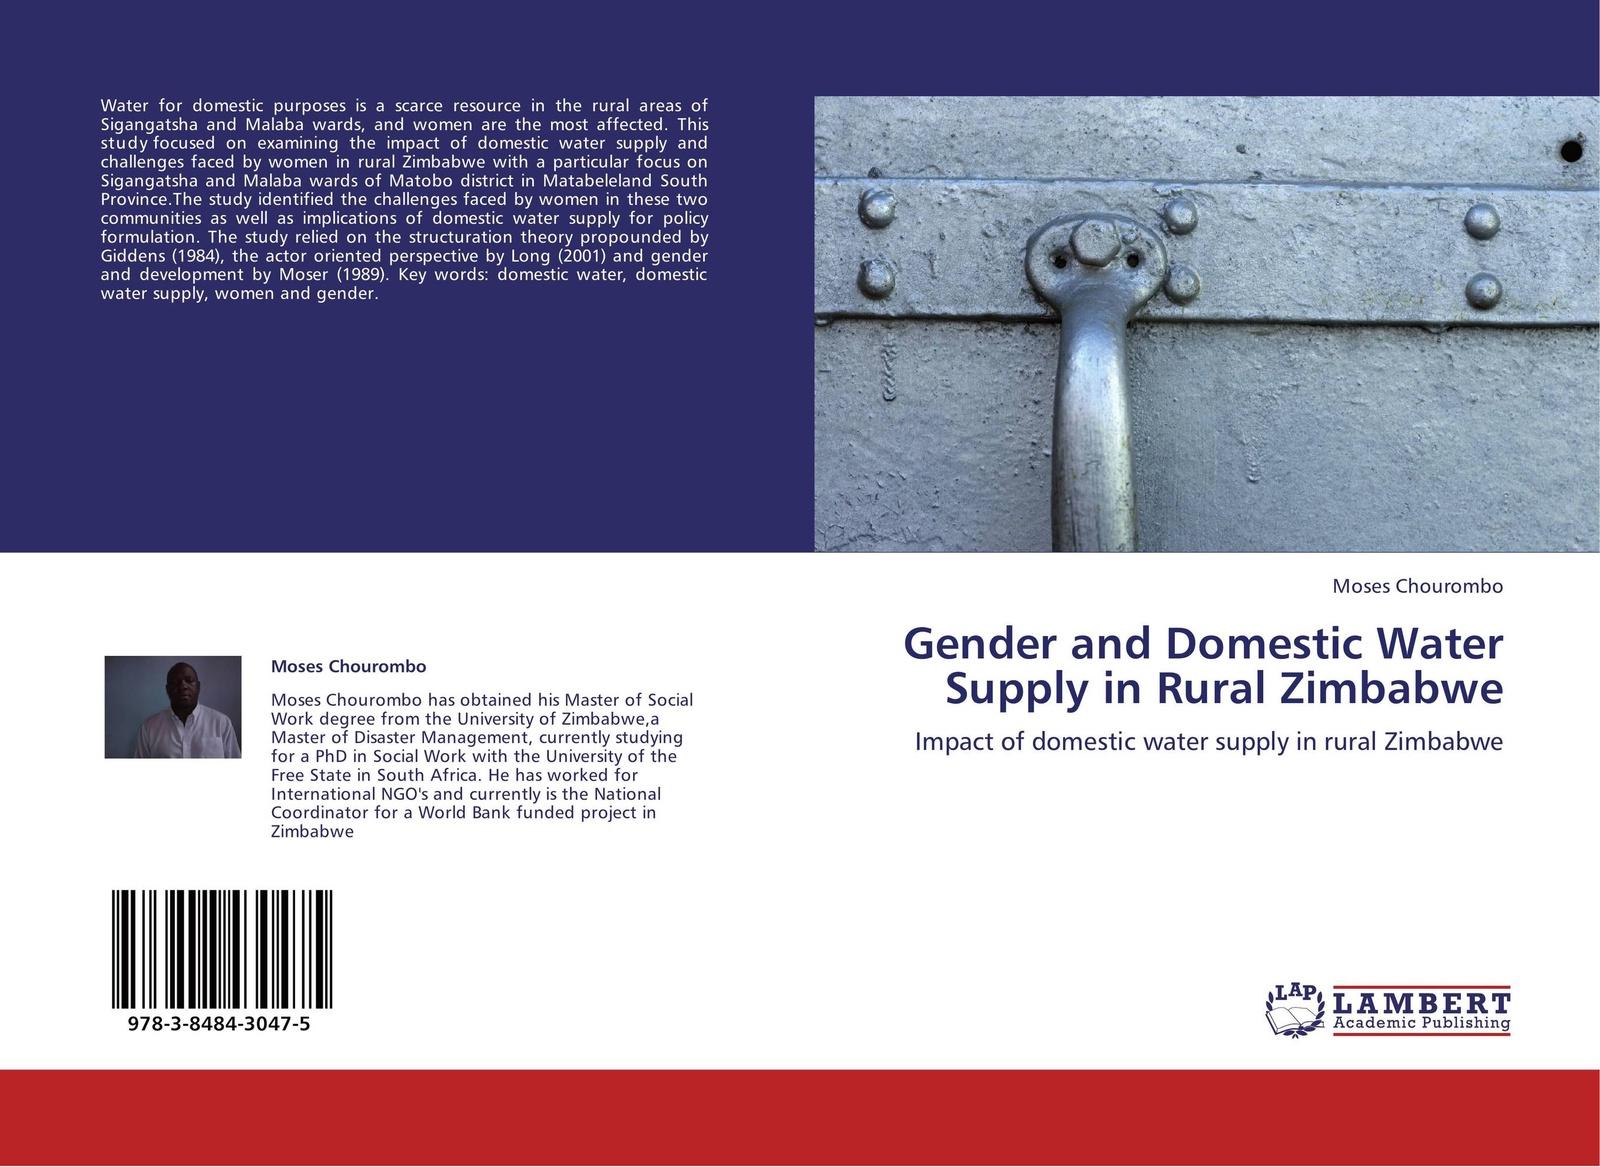 Moses Chourombo Gender and Domestic Water Supply in Rural Zimbabwe цена в Москве и Питере